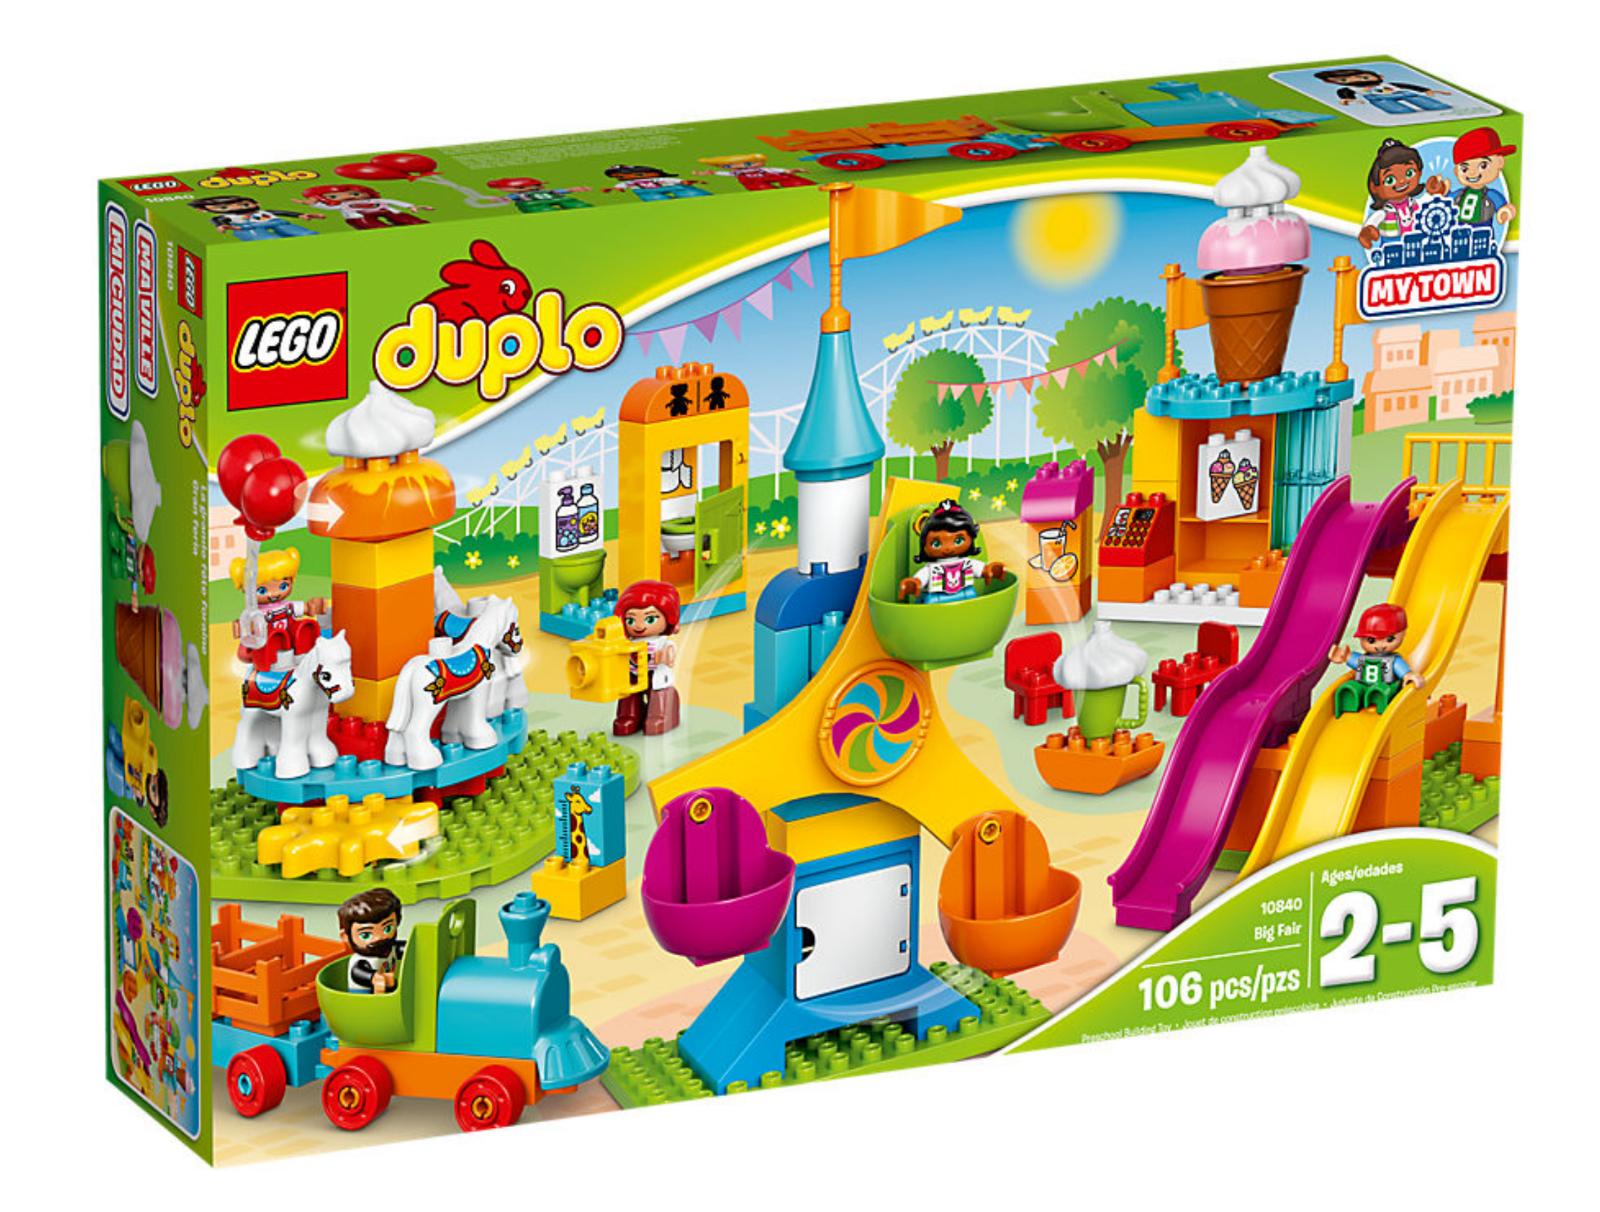 LEGO DUPLO 10840-Grande  fête foraine NEUF neuf dans sa boîte  Achetez maintenant